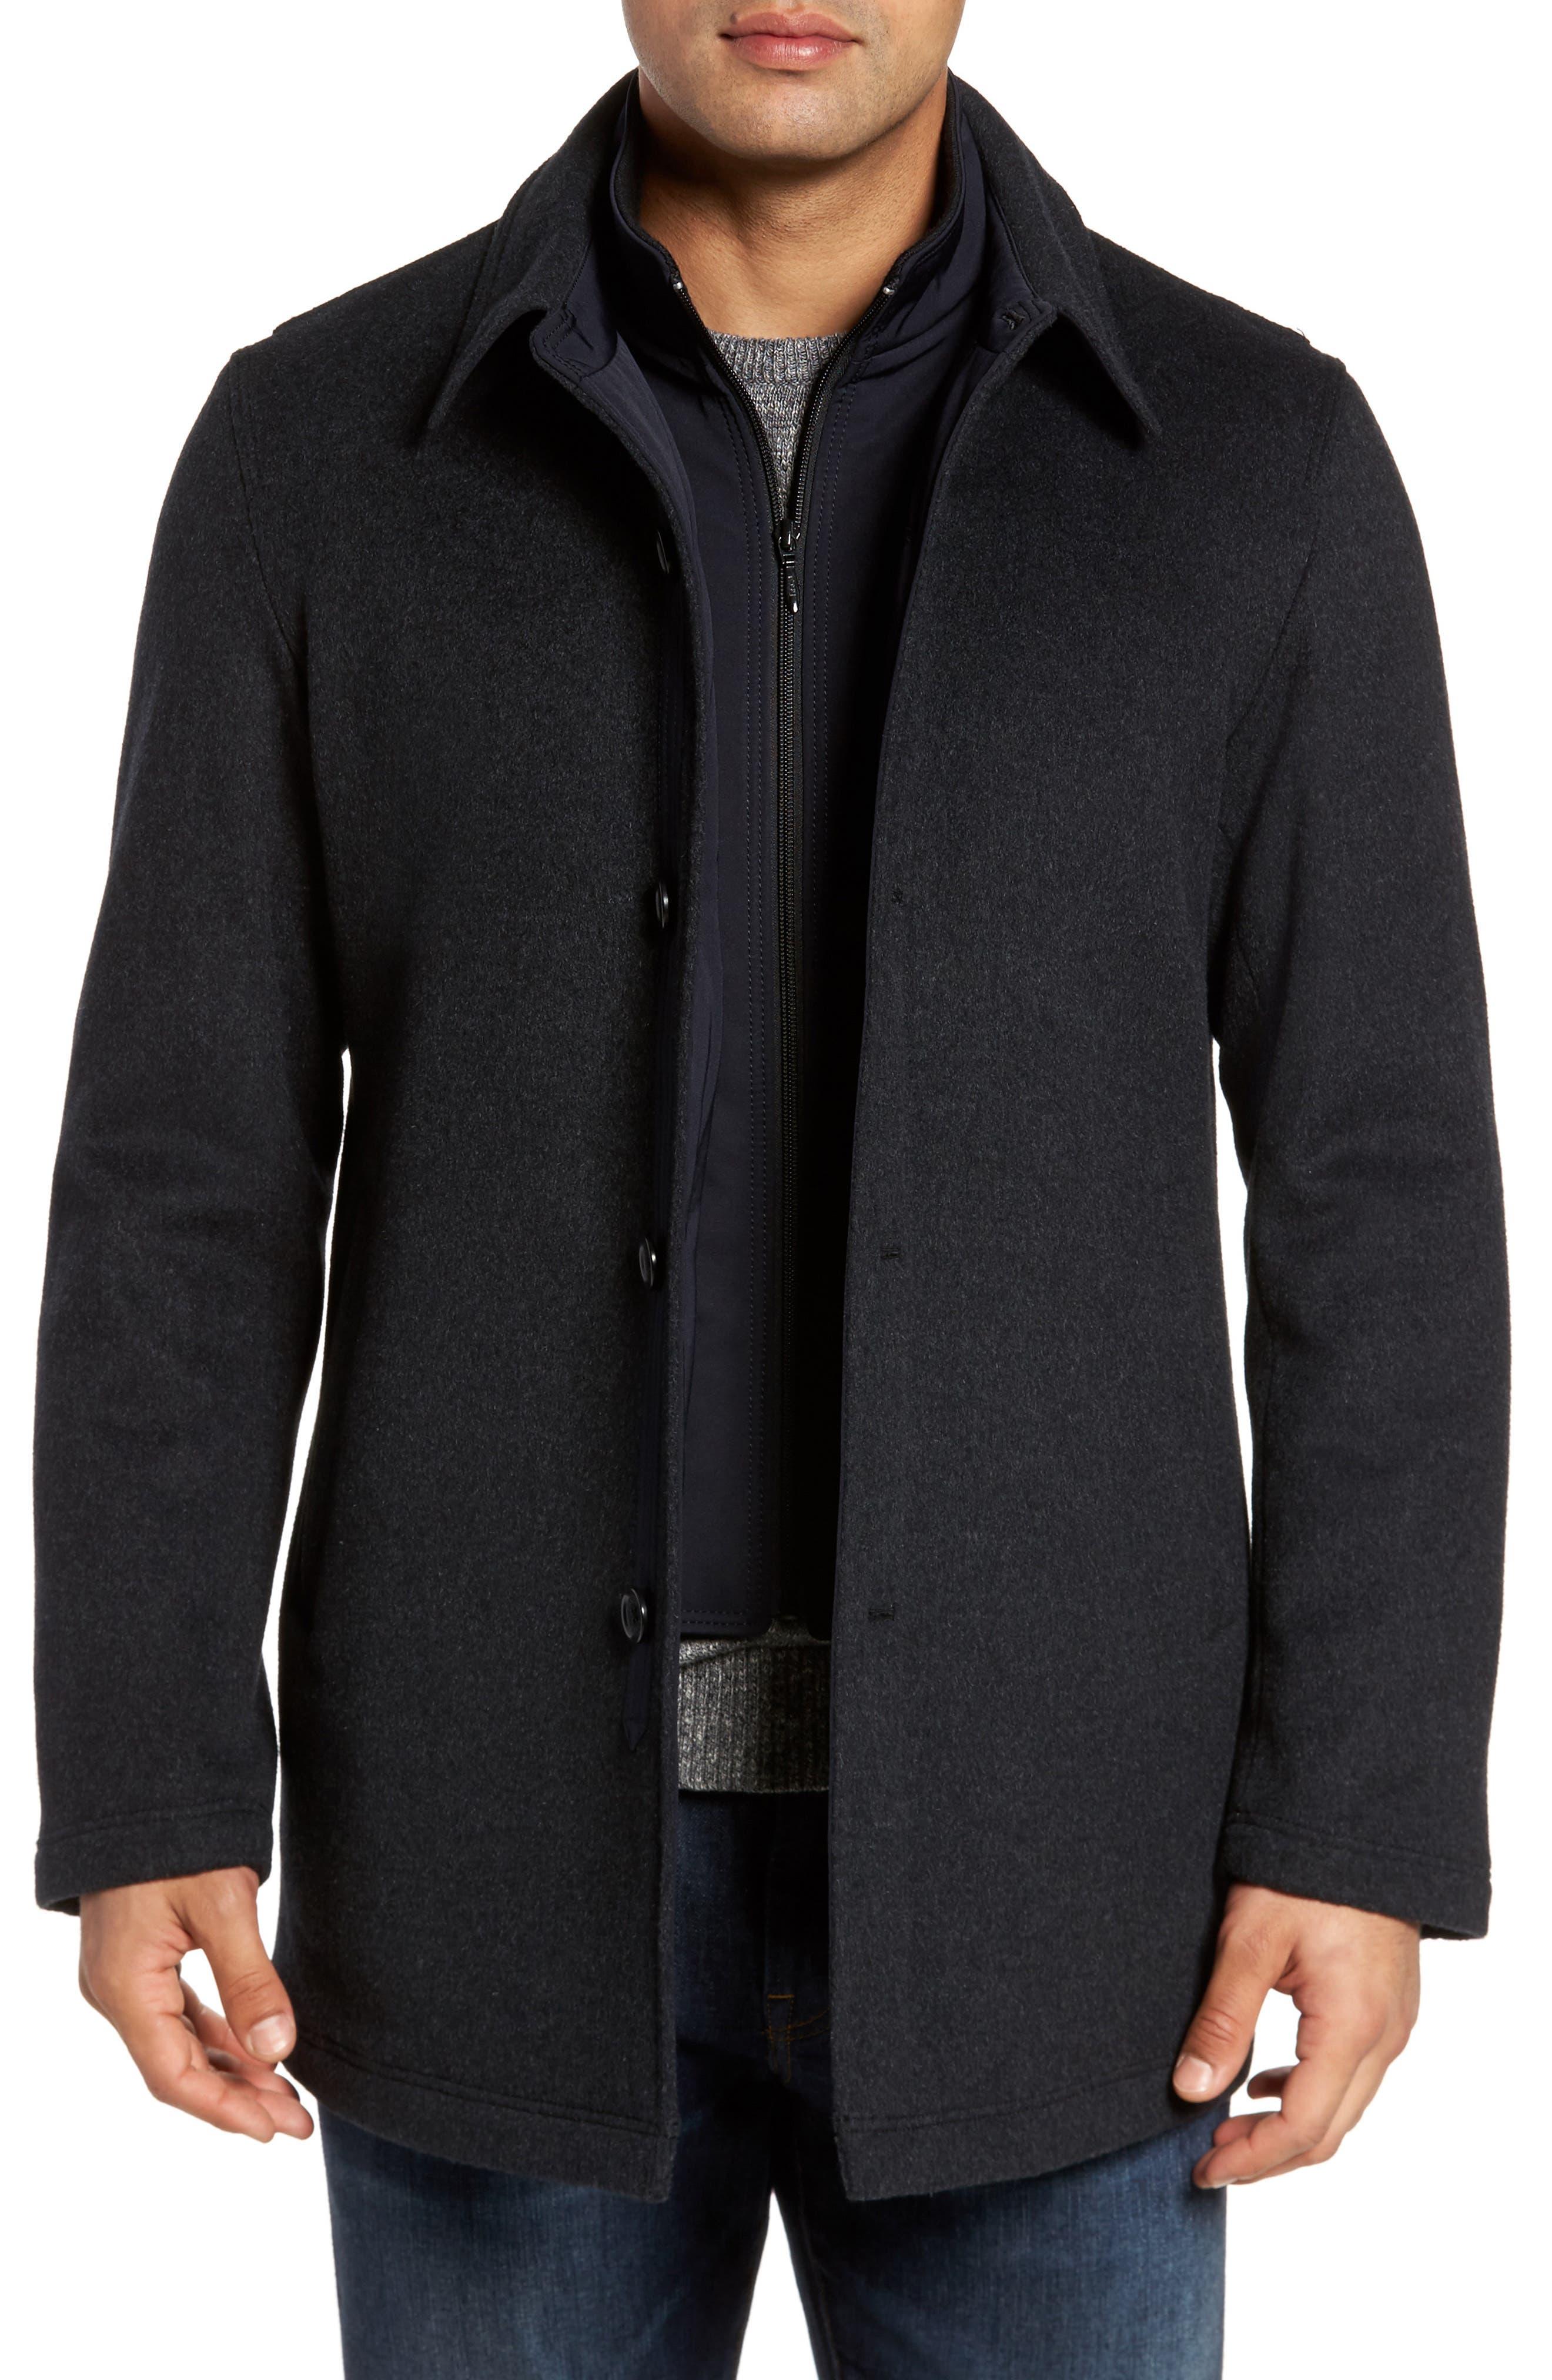 Sanyo Jackson Wool Car Coat